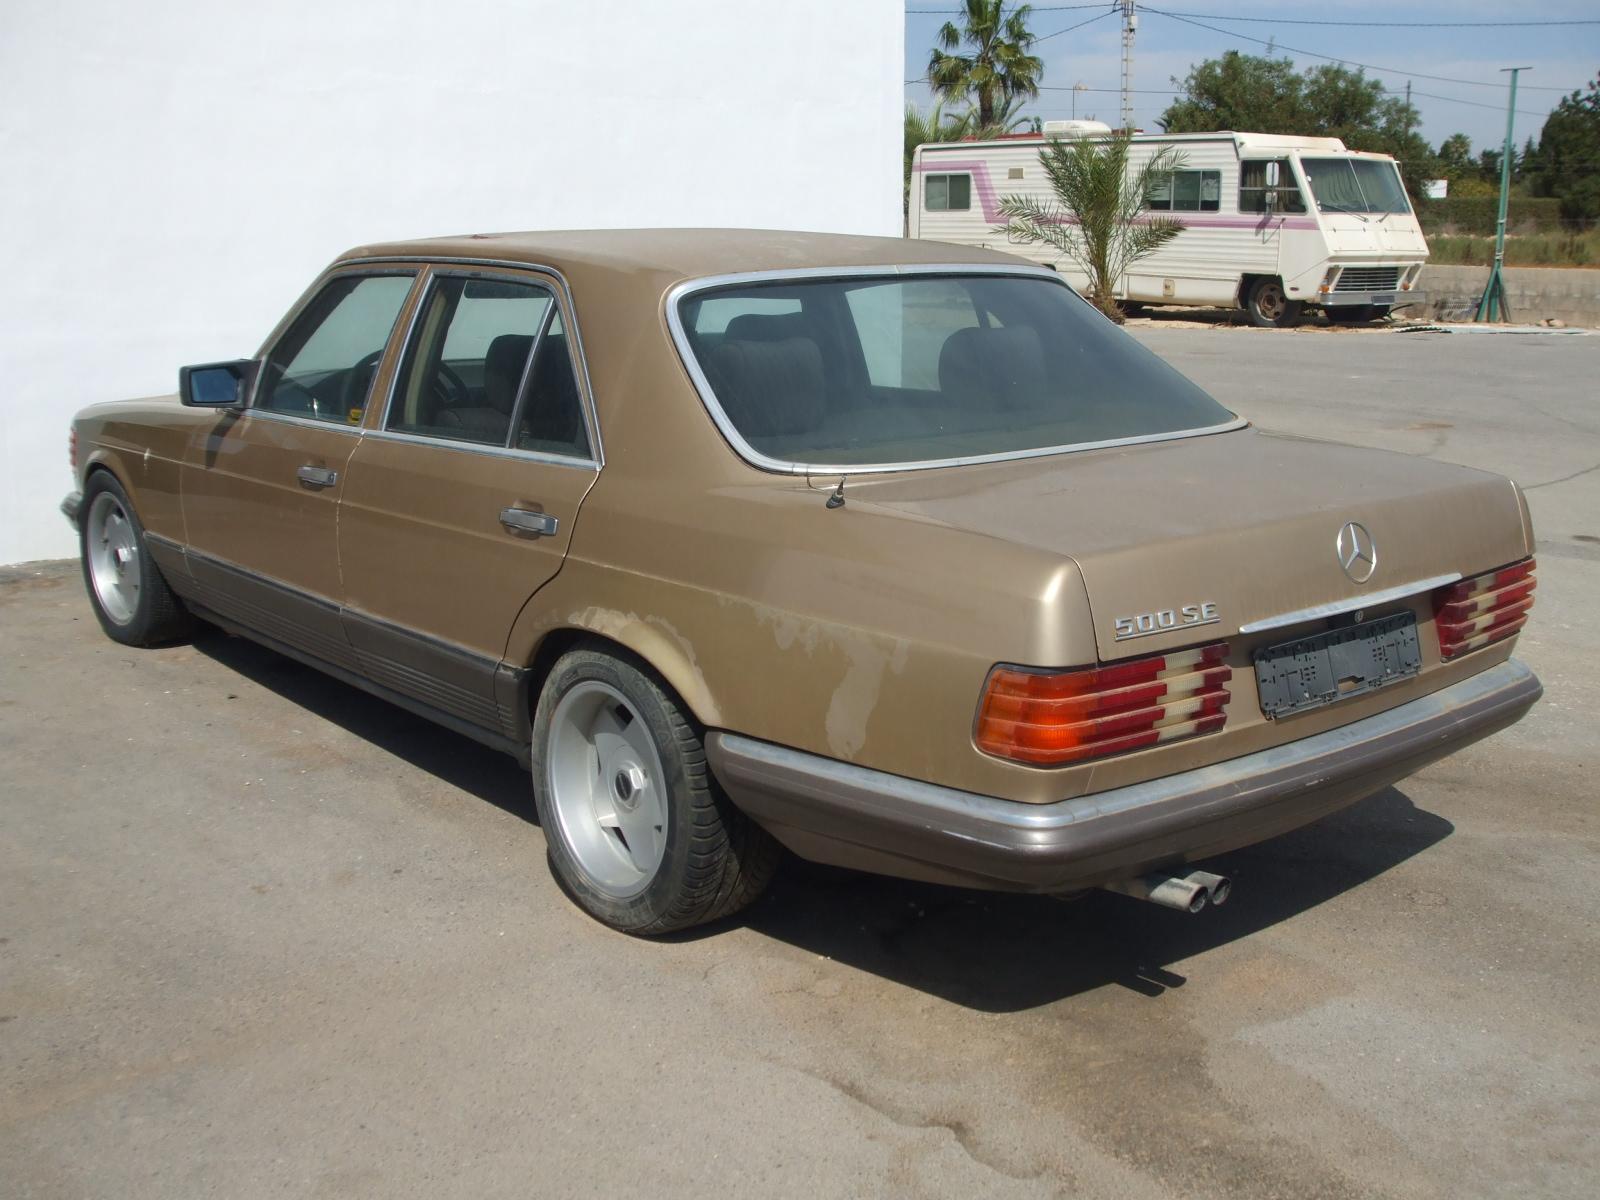 Mercedes benz 500 se photos reviews news specs buy car for Buy a mercedes benz